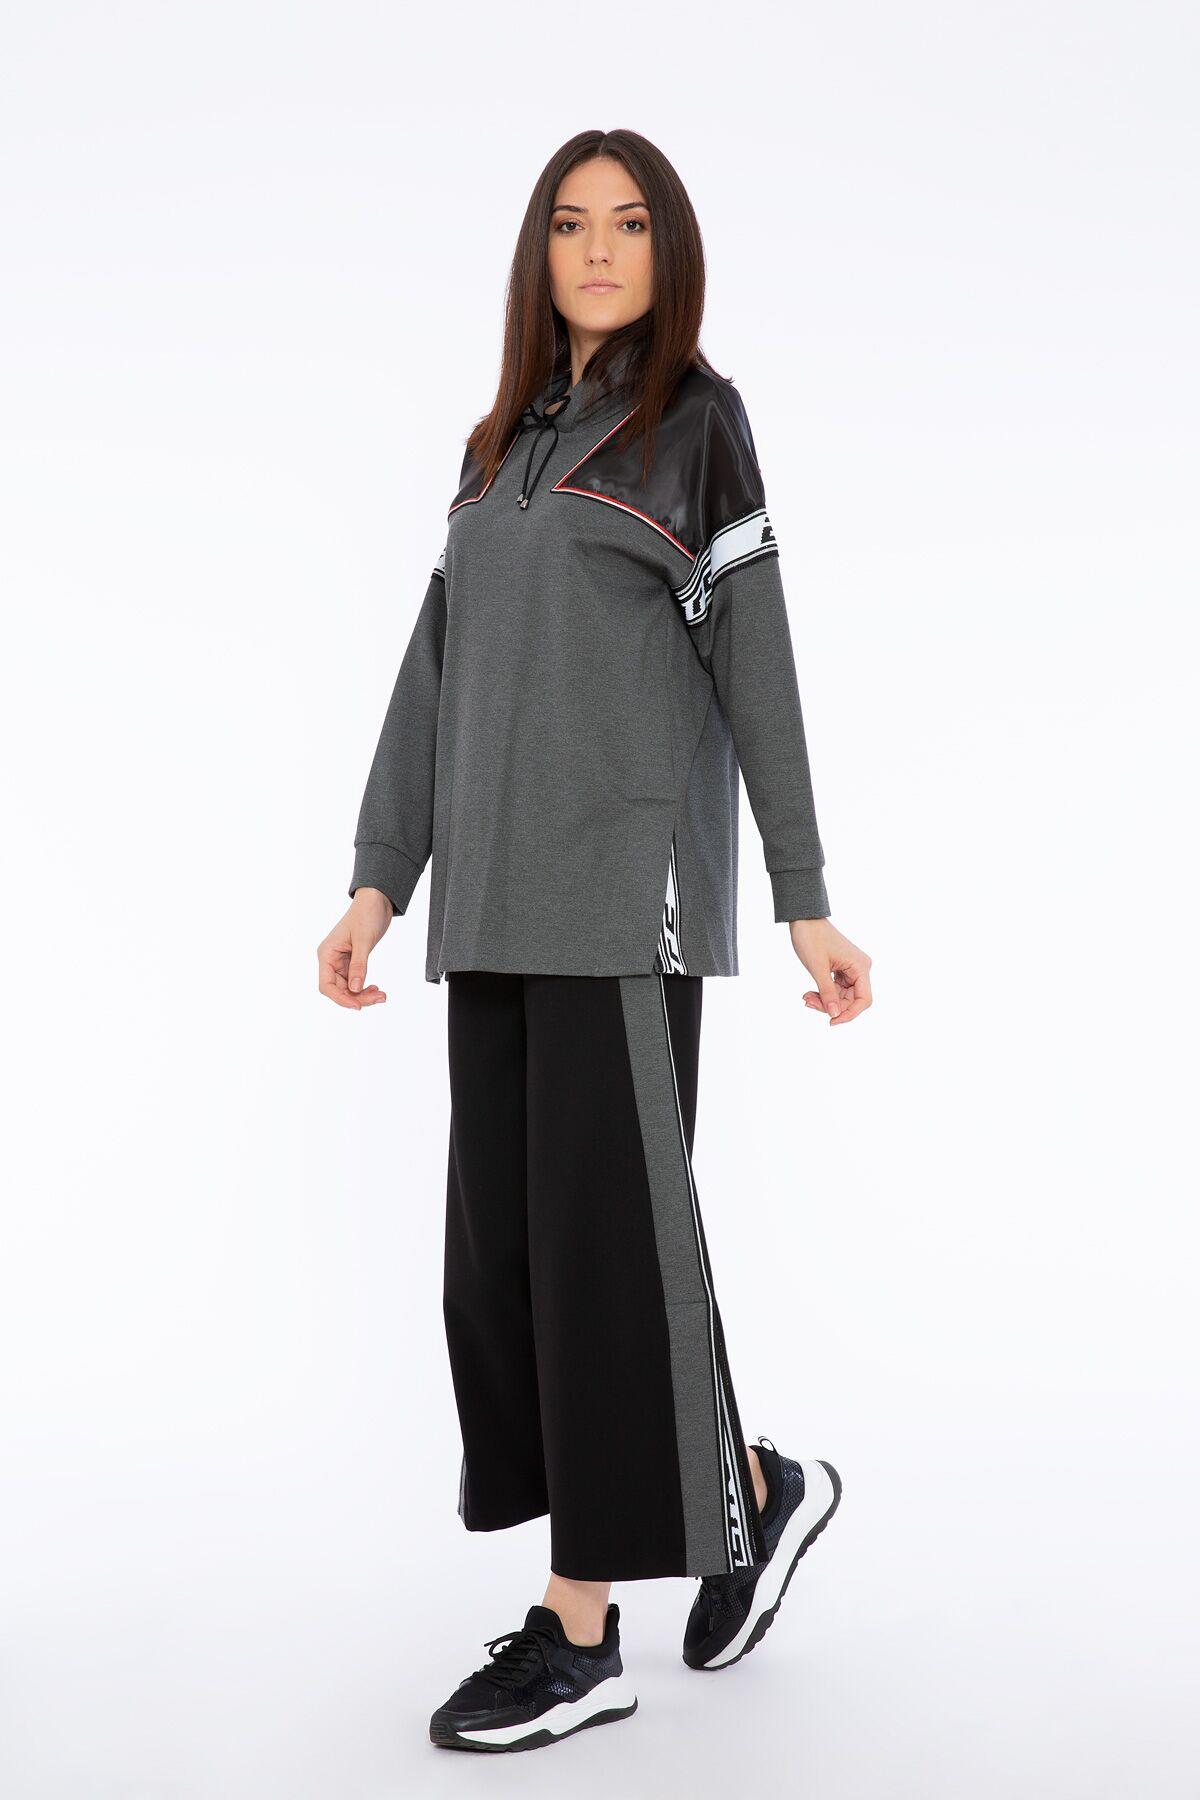 Transparent Shoulder and Stripe Detailed Gray Hooded Sweatshirt